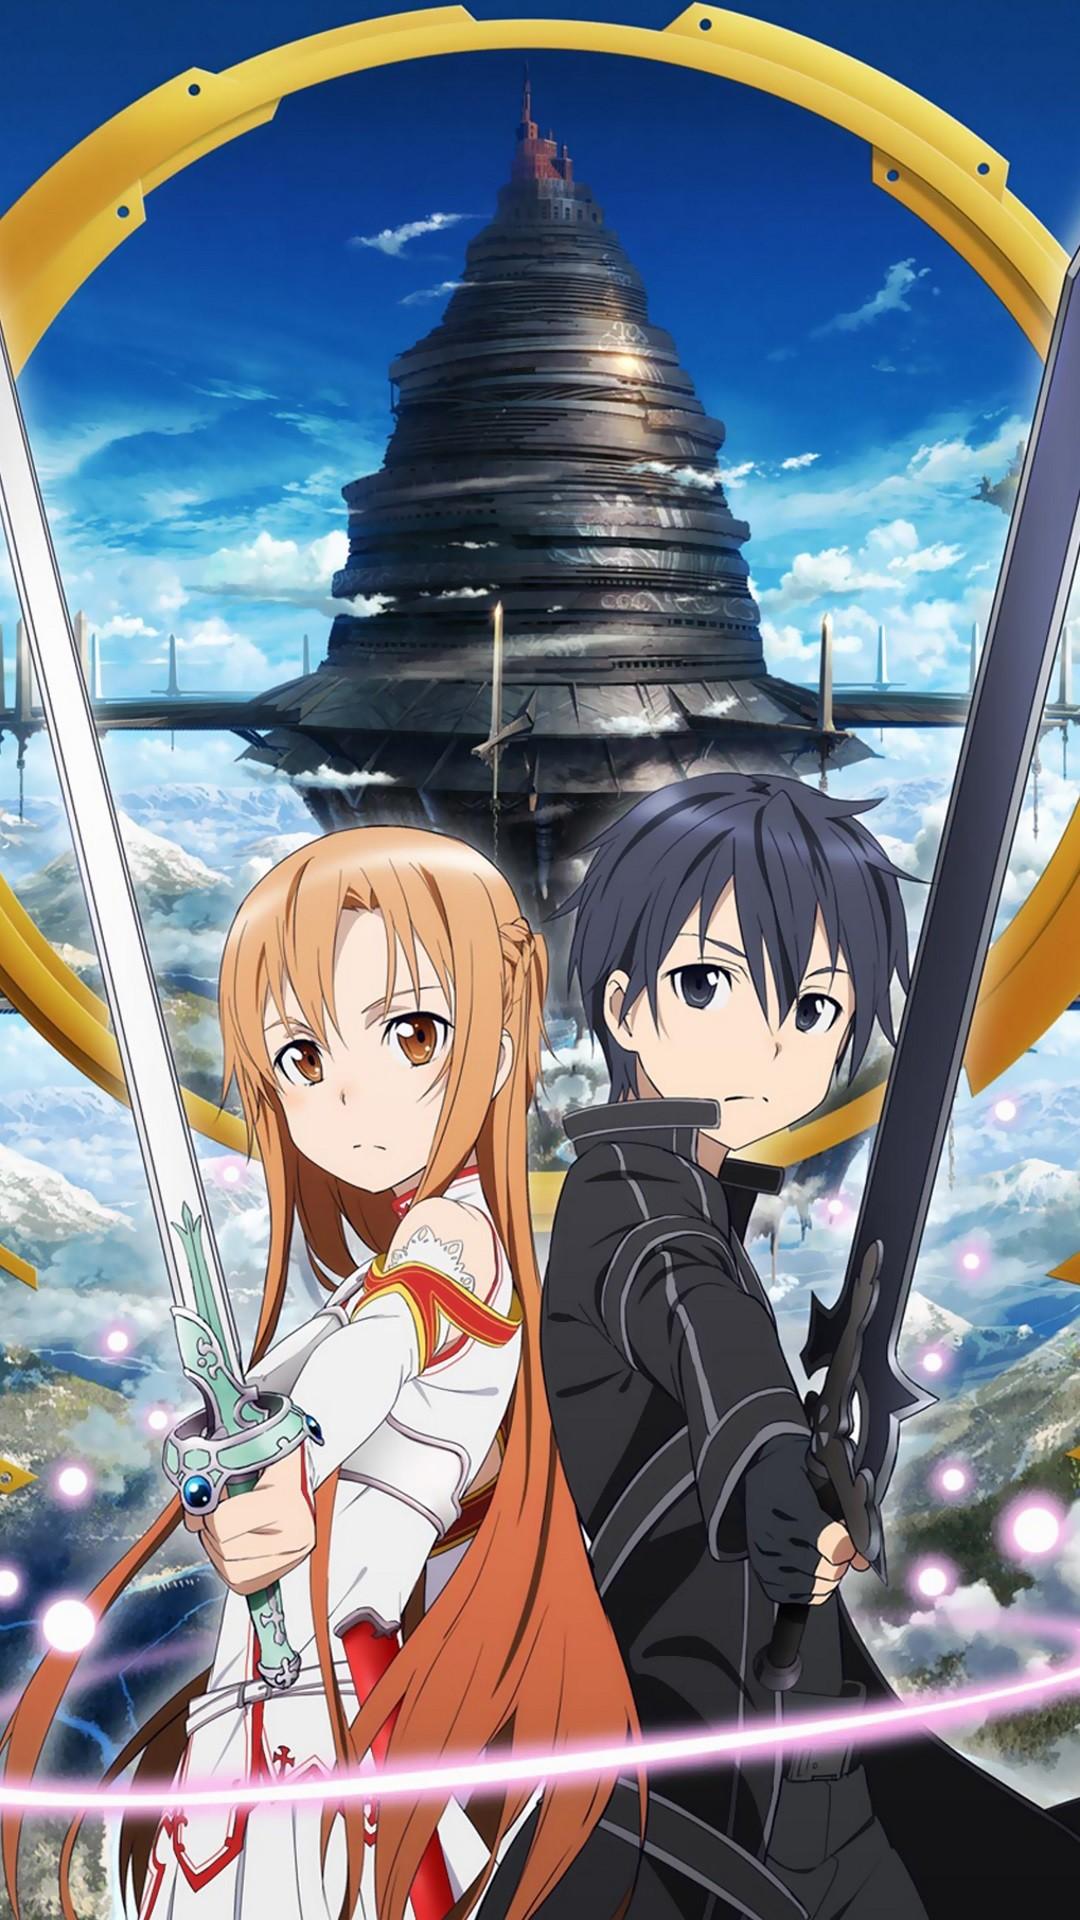 Sword Art Online 2 Kirito Asuna.Sony Xperia Z wallpaper 1080×1920